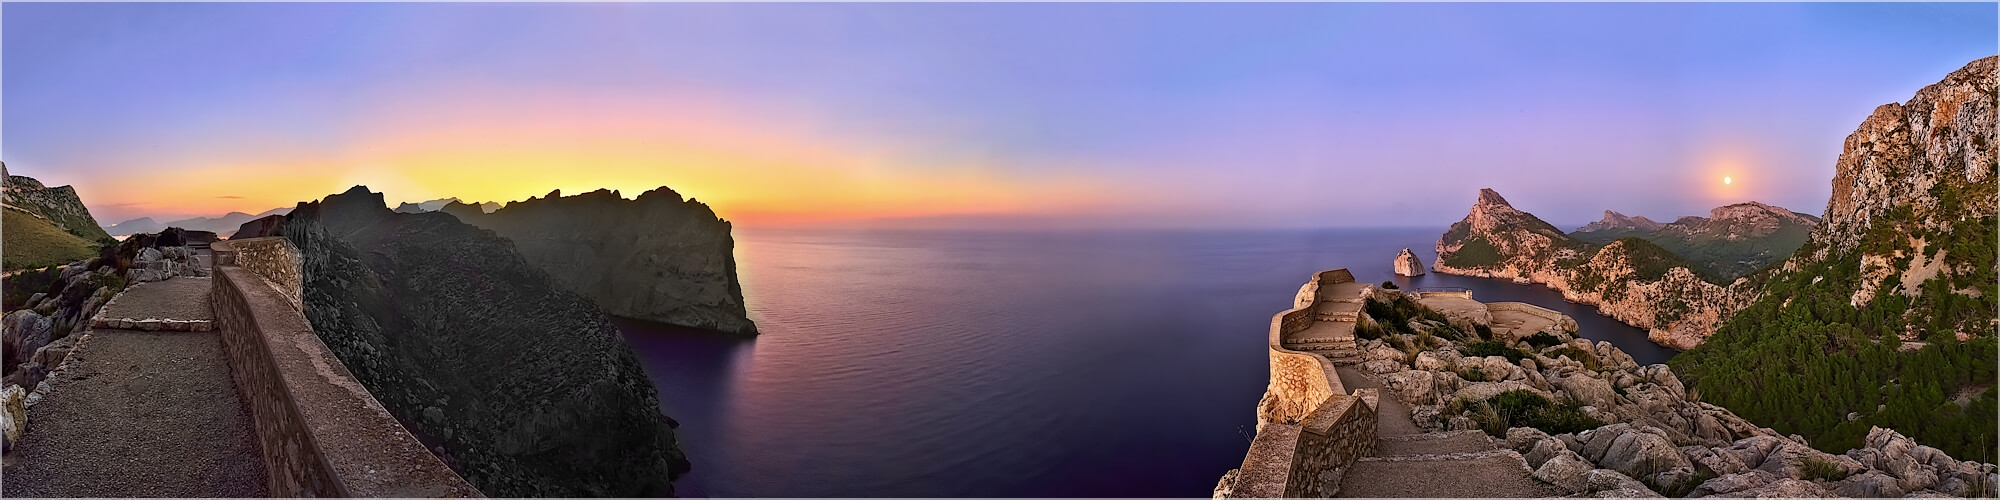 Panoramabild Letztes Licht Cap Formentor Mallorca